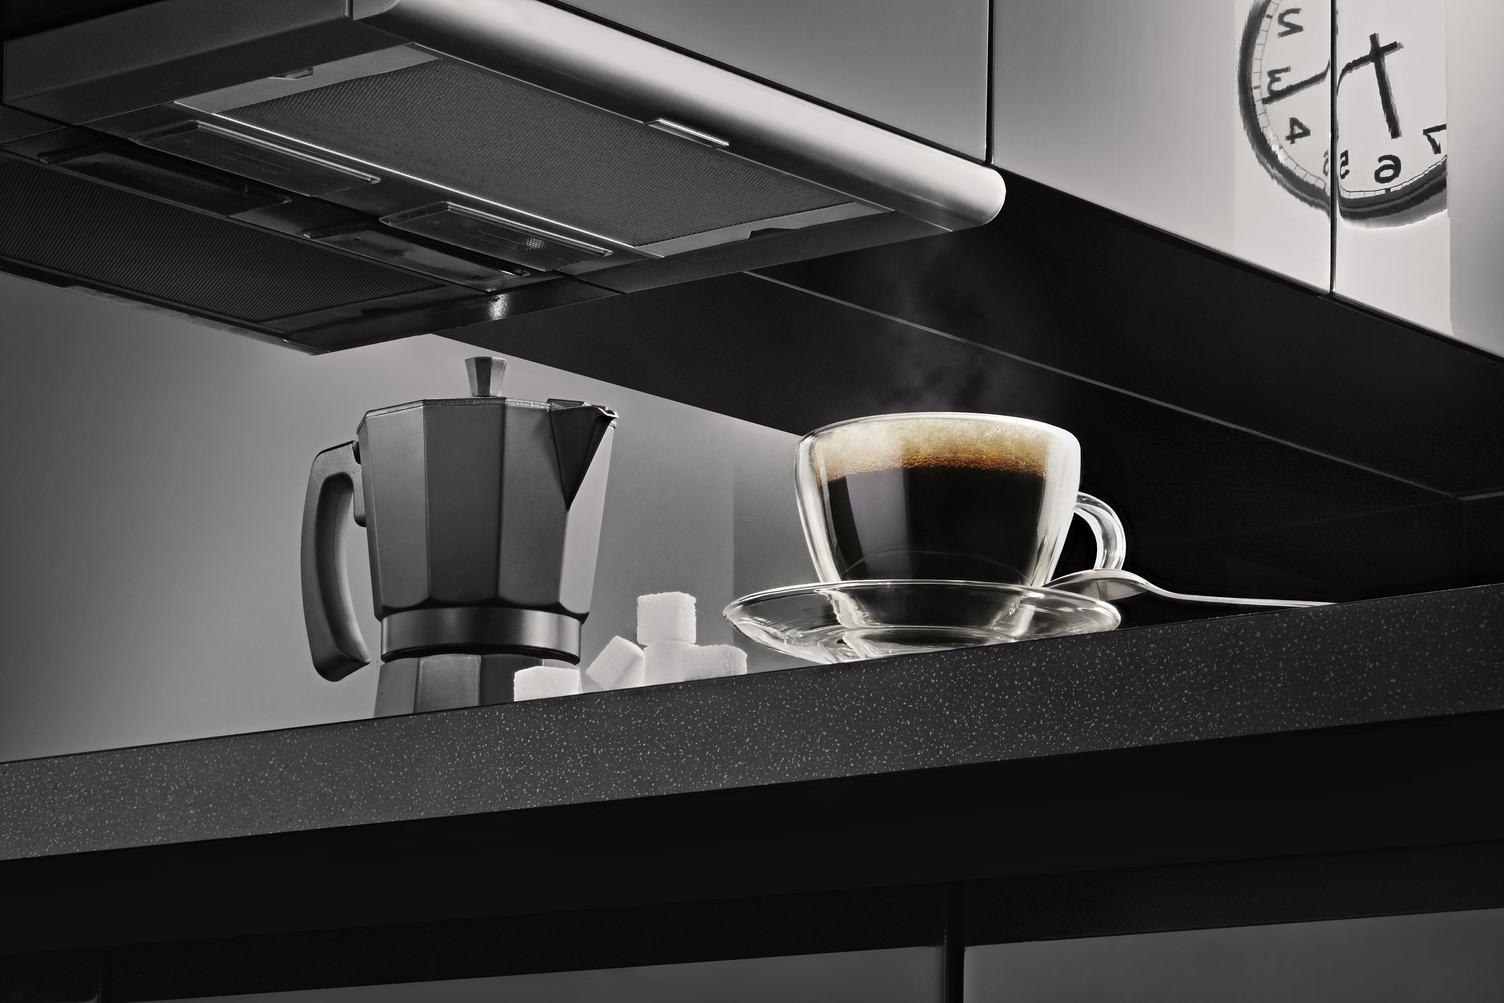 Hot Coffee from Percolator